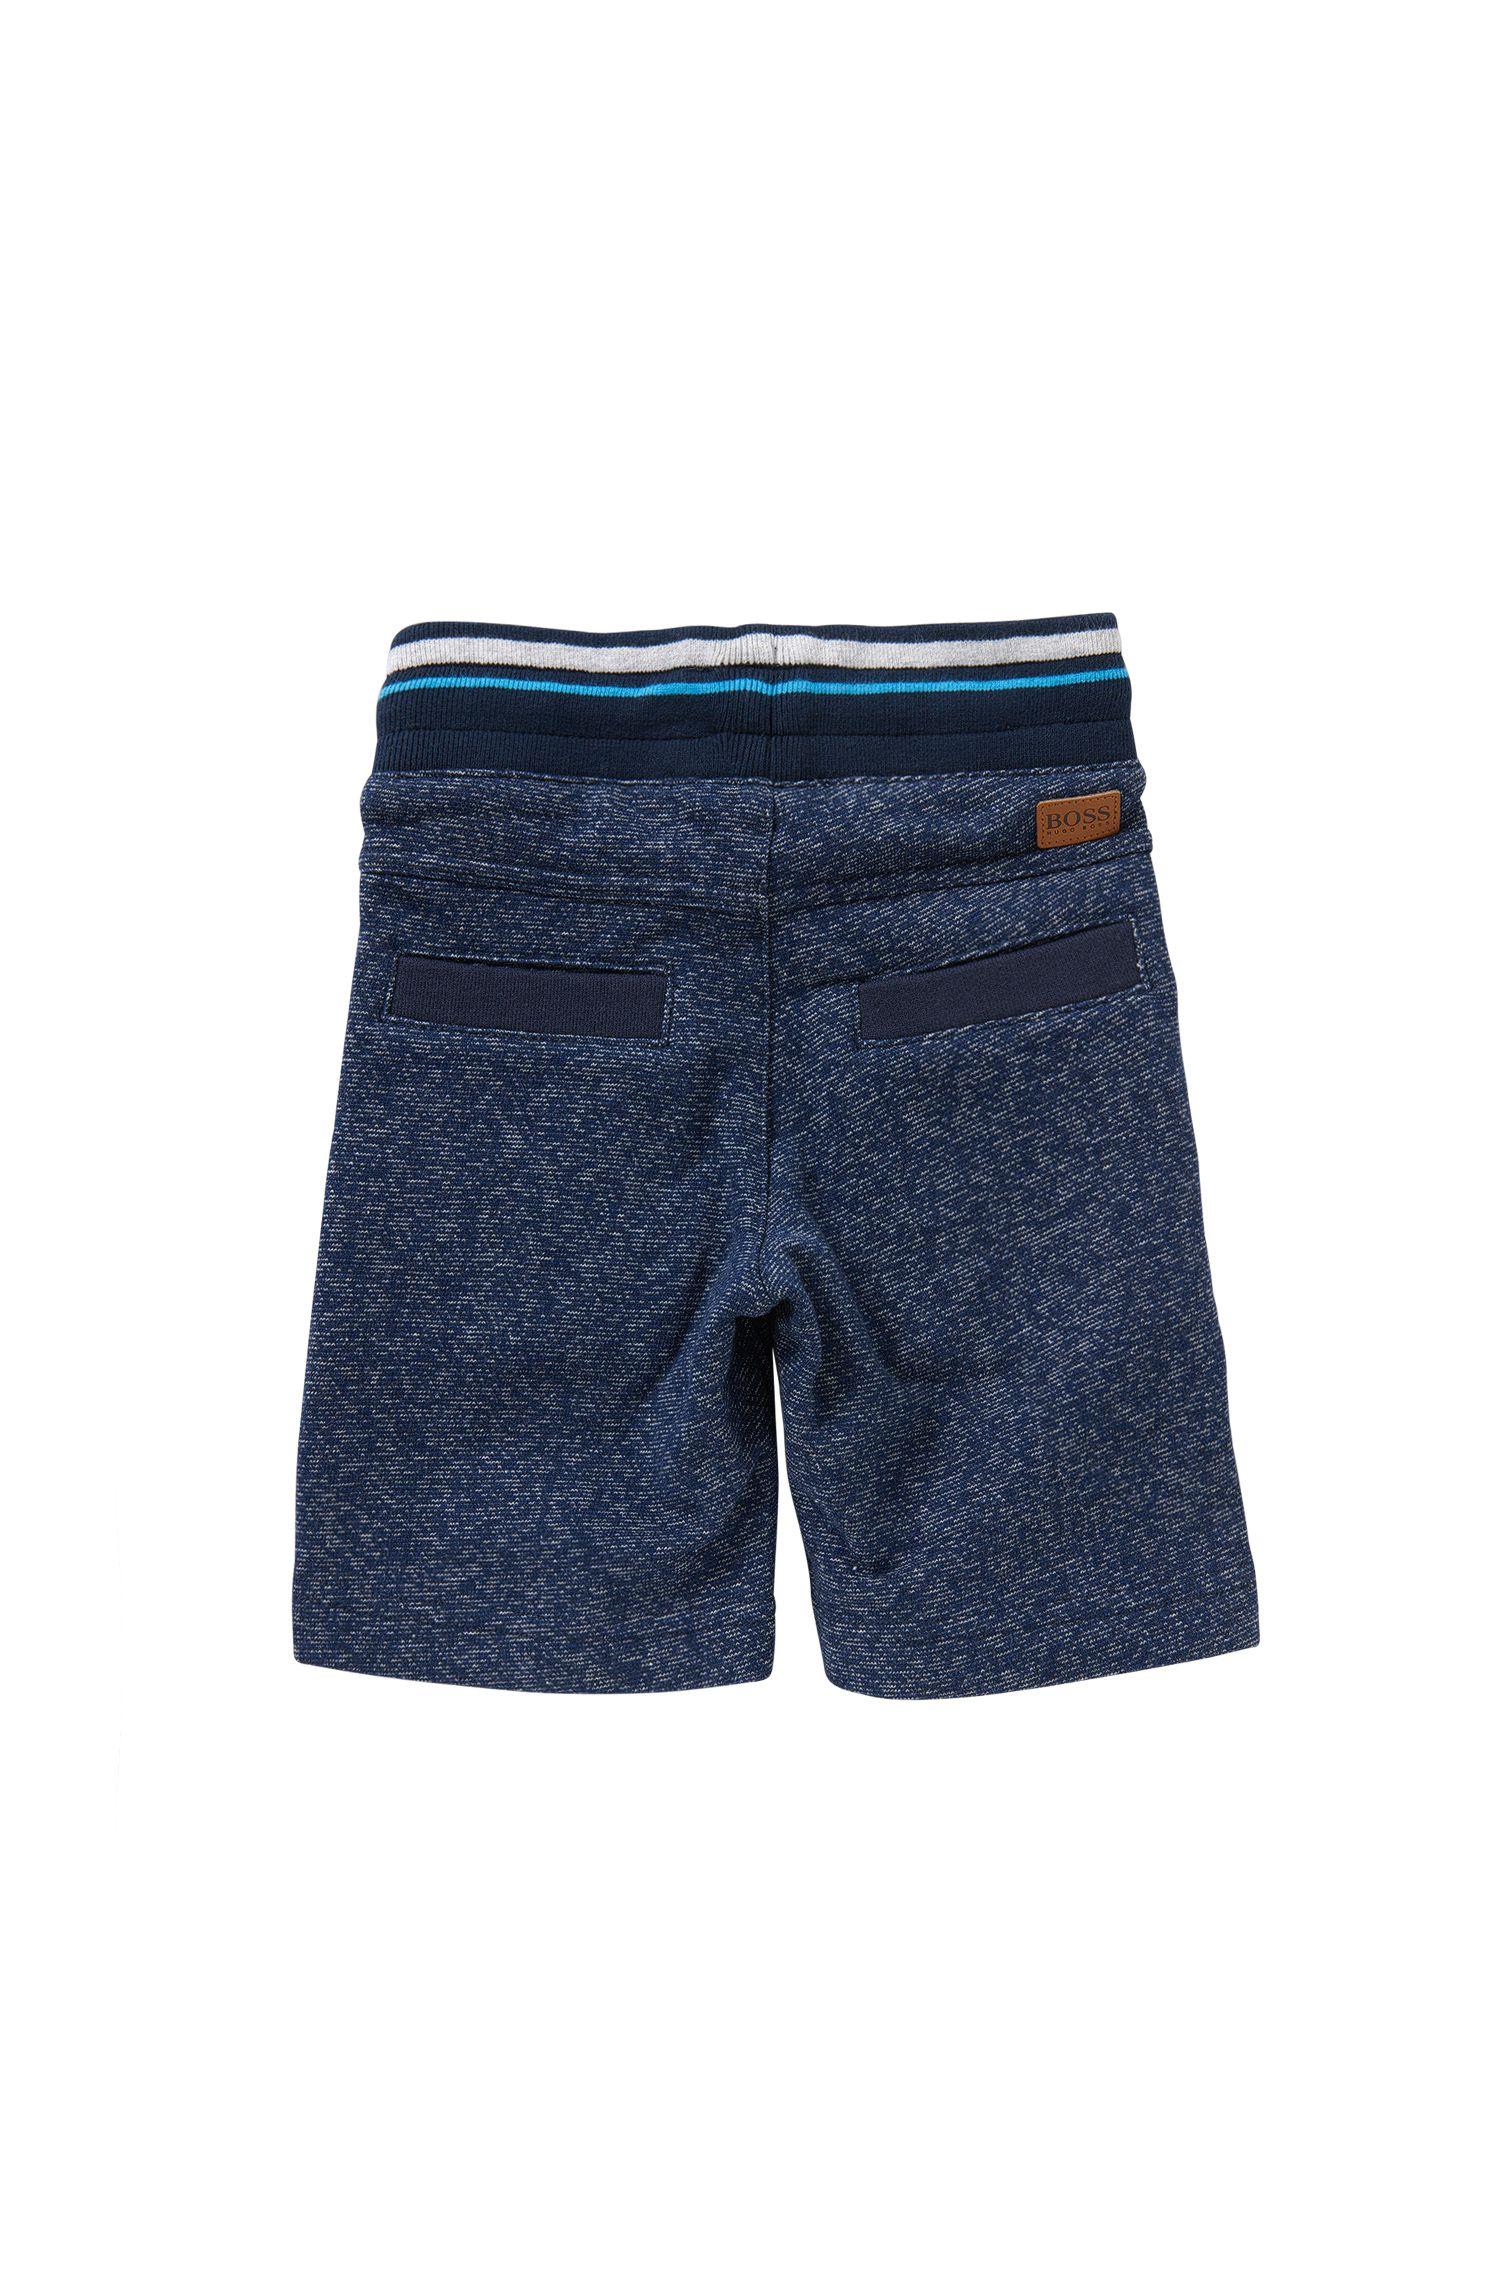 Pantalon sweat pour enfant en coton avec cordon de serrage: «J24385»